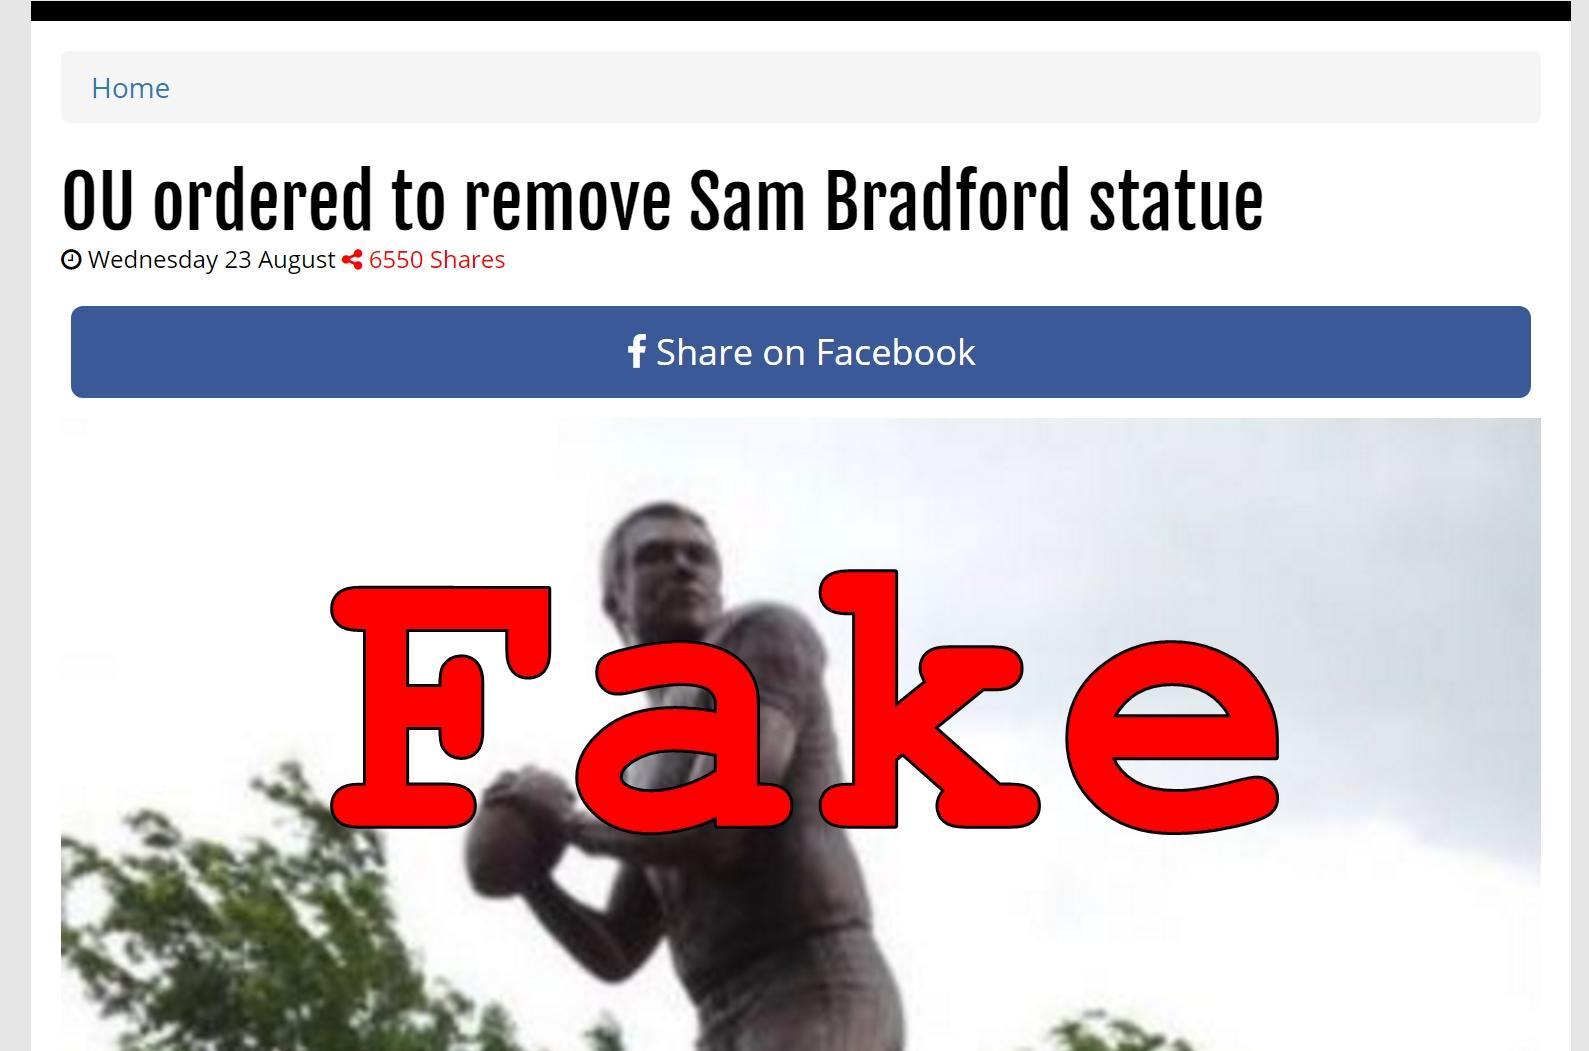 Fake News: University Of Oklahoma NOT Ordered To Remove Sam Bradford Statue